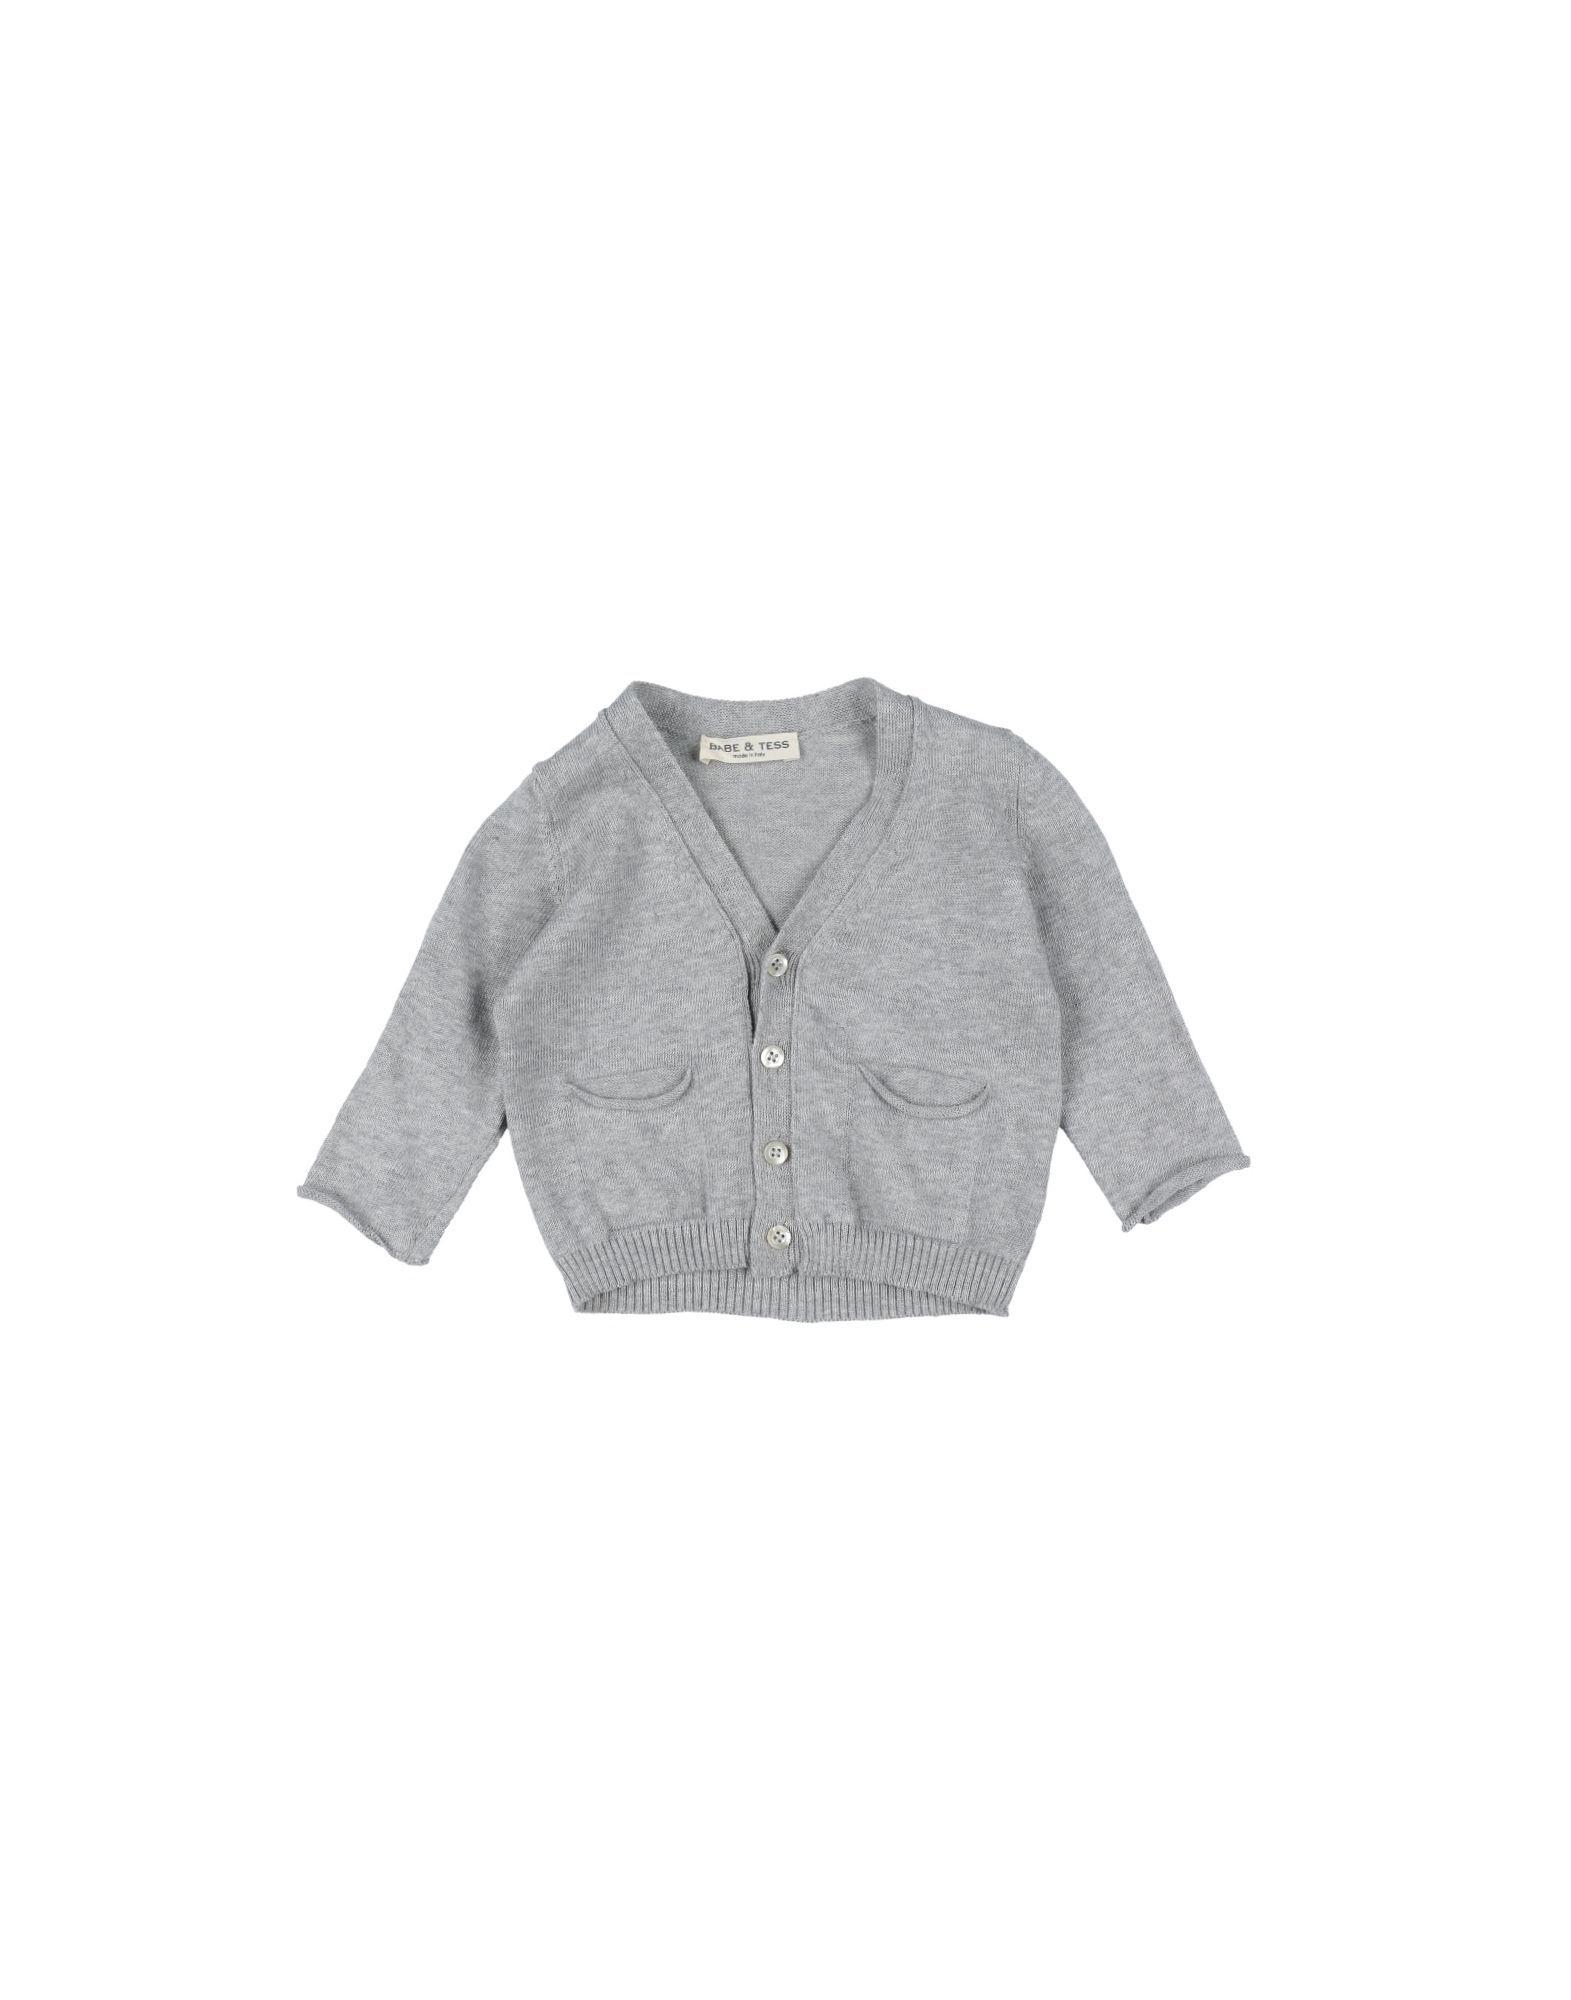 KNITWEAR Babe & Tess Light grey Girl Cotton